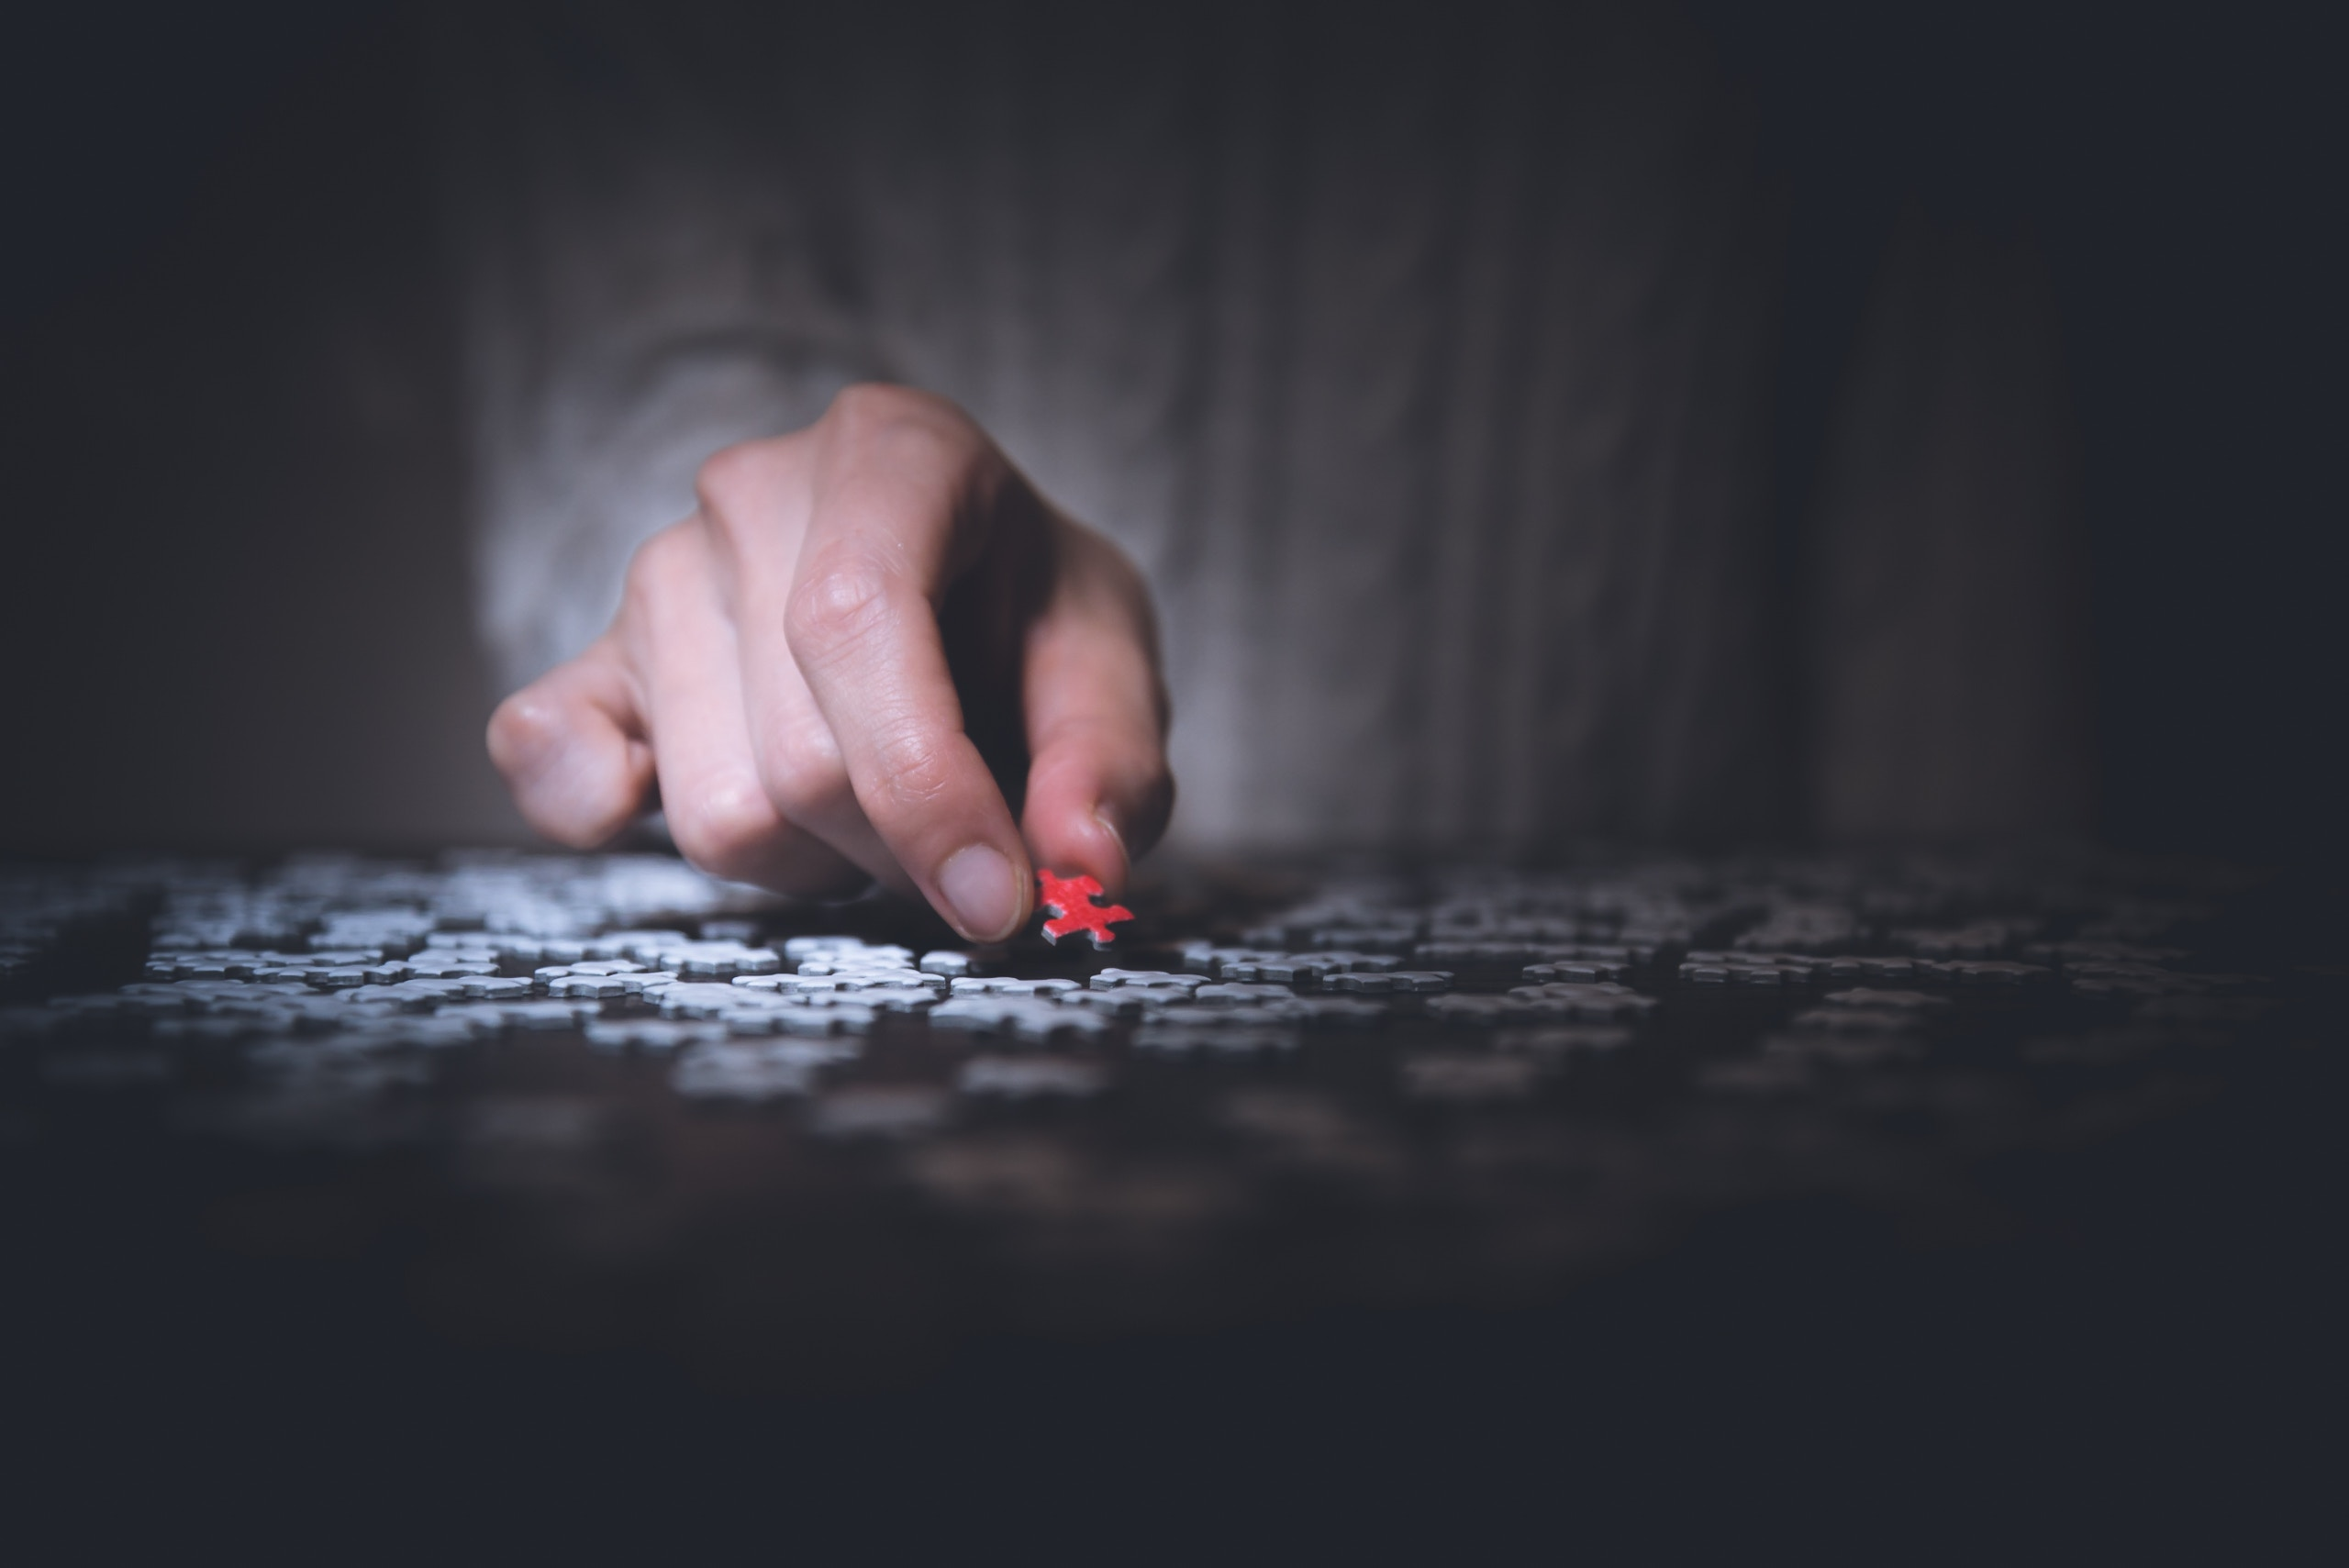 hand-puzzle